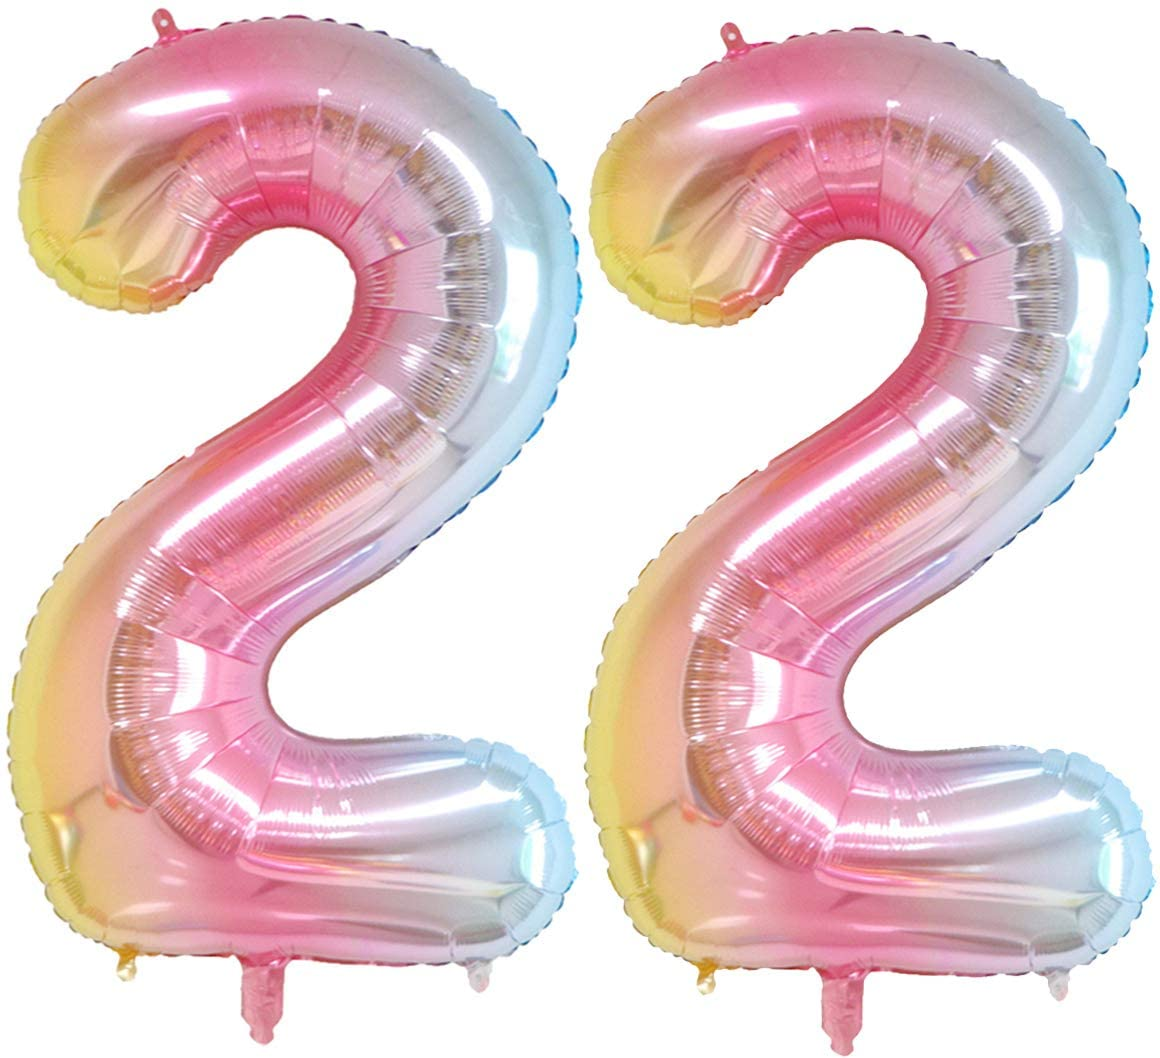 40 inch Number Balloons Foil Helium - 2 PCs Balloons for Birthday Party Decorations Mylar Rainbow Digital Jumbo Balloons for Wedding Anniversary (Rainbow, NO.2)